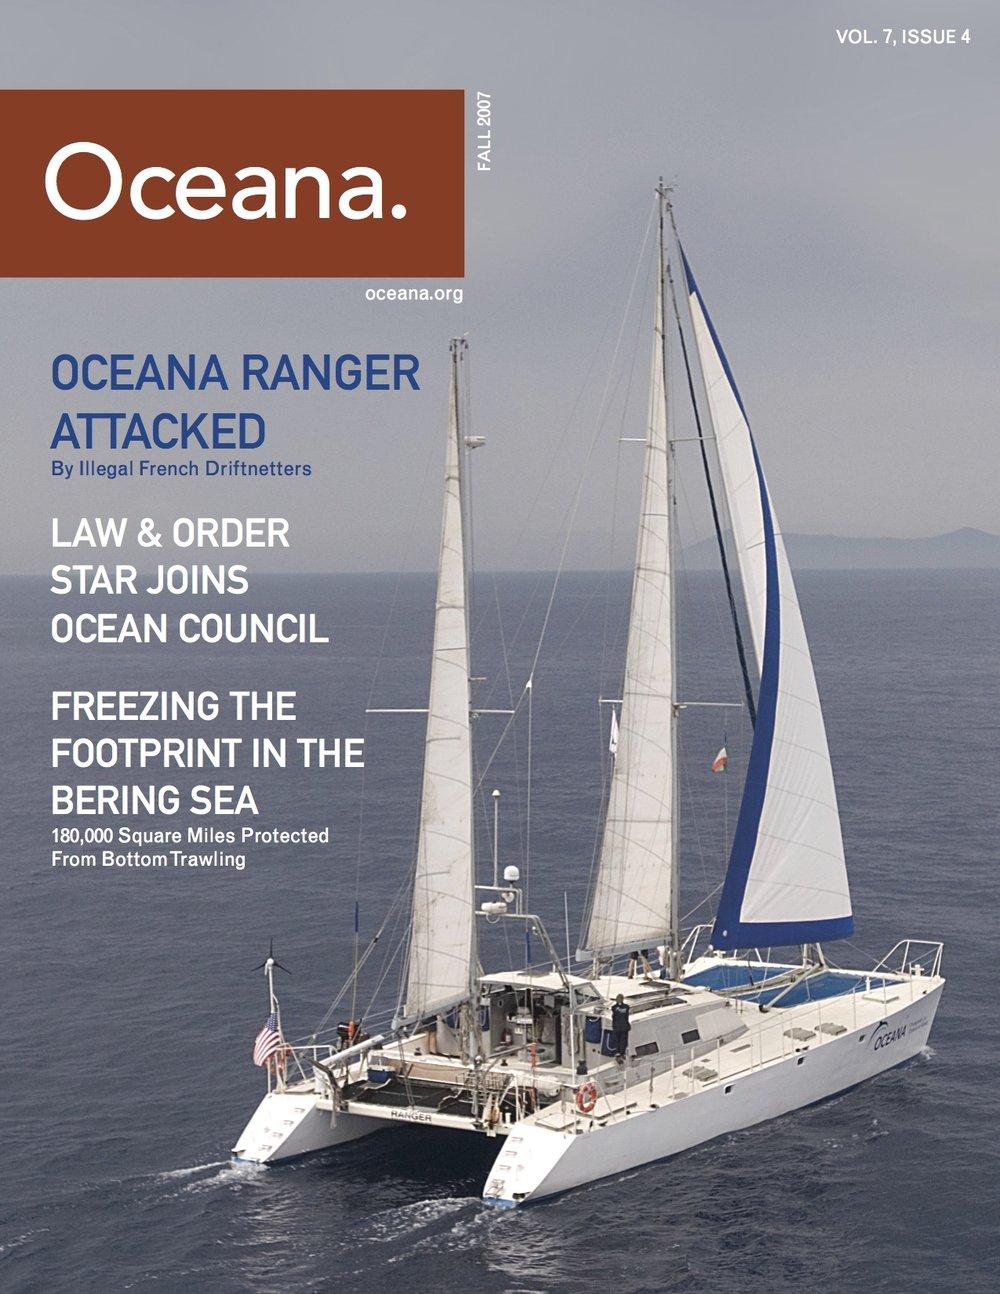 OceanaNLFall07.jpg